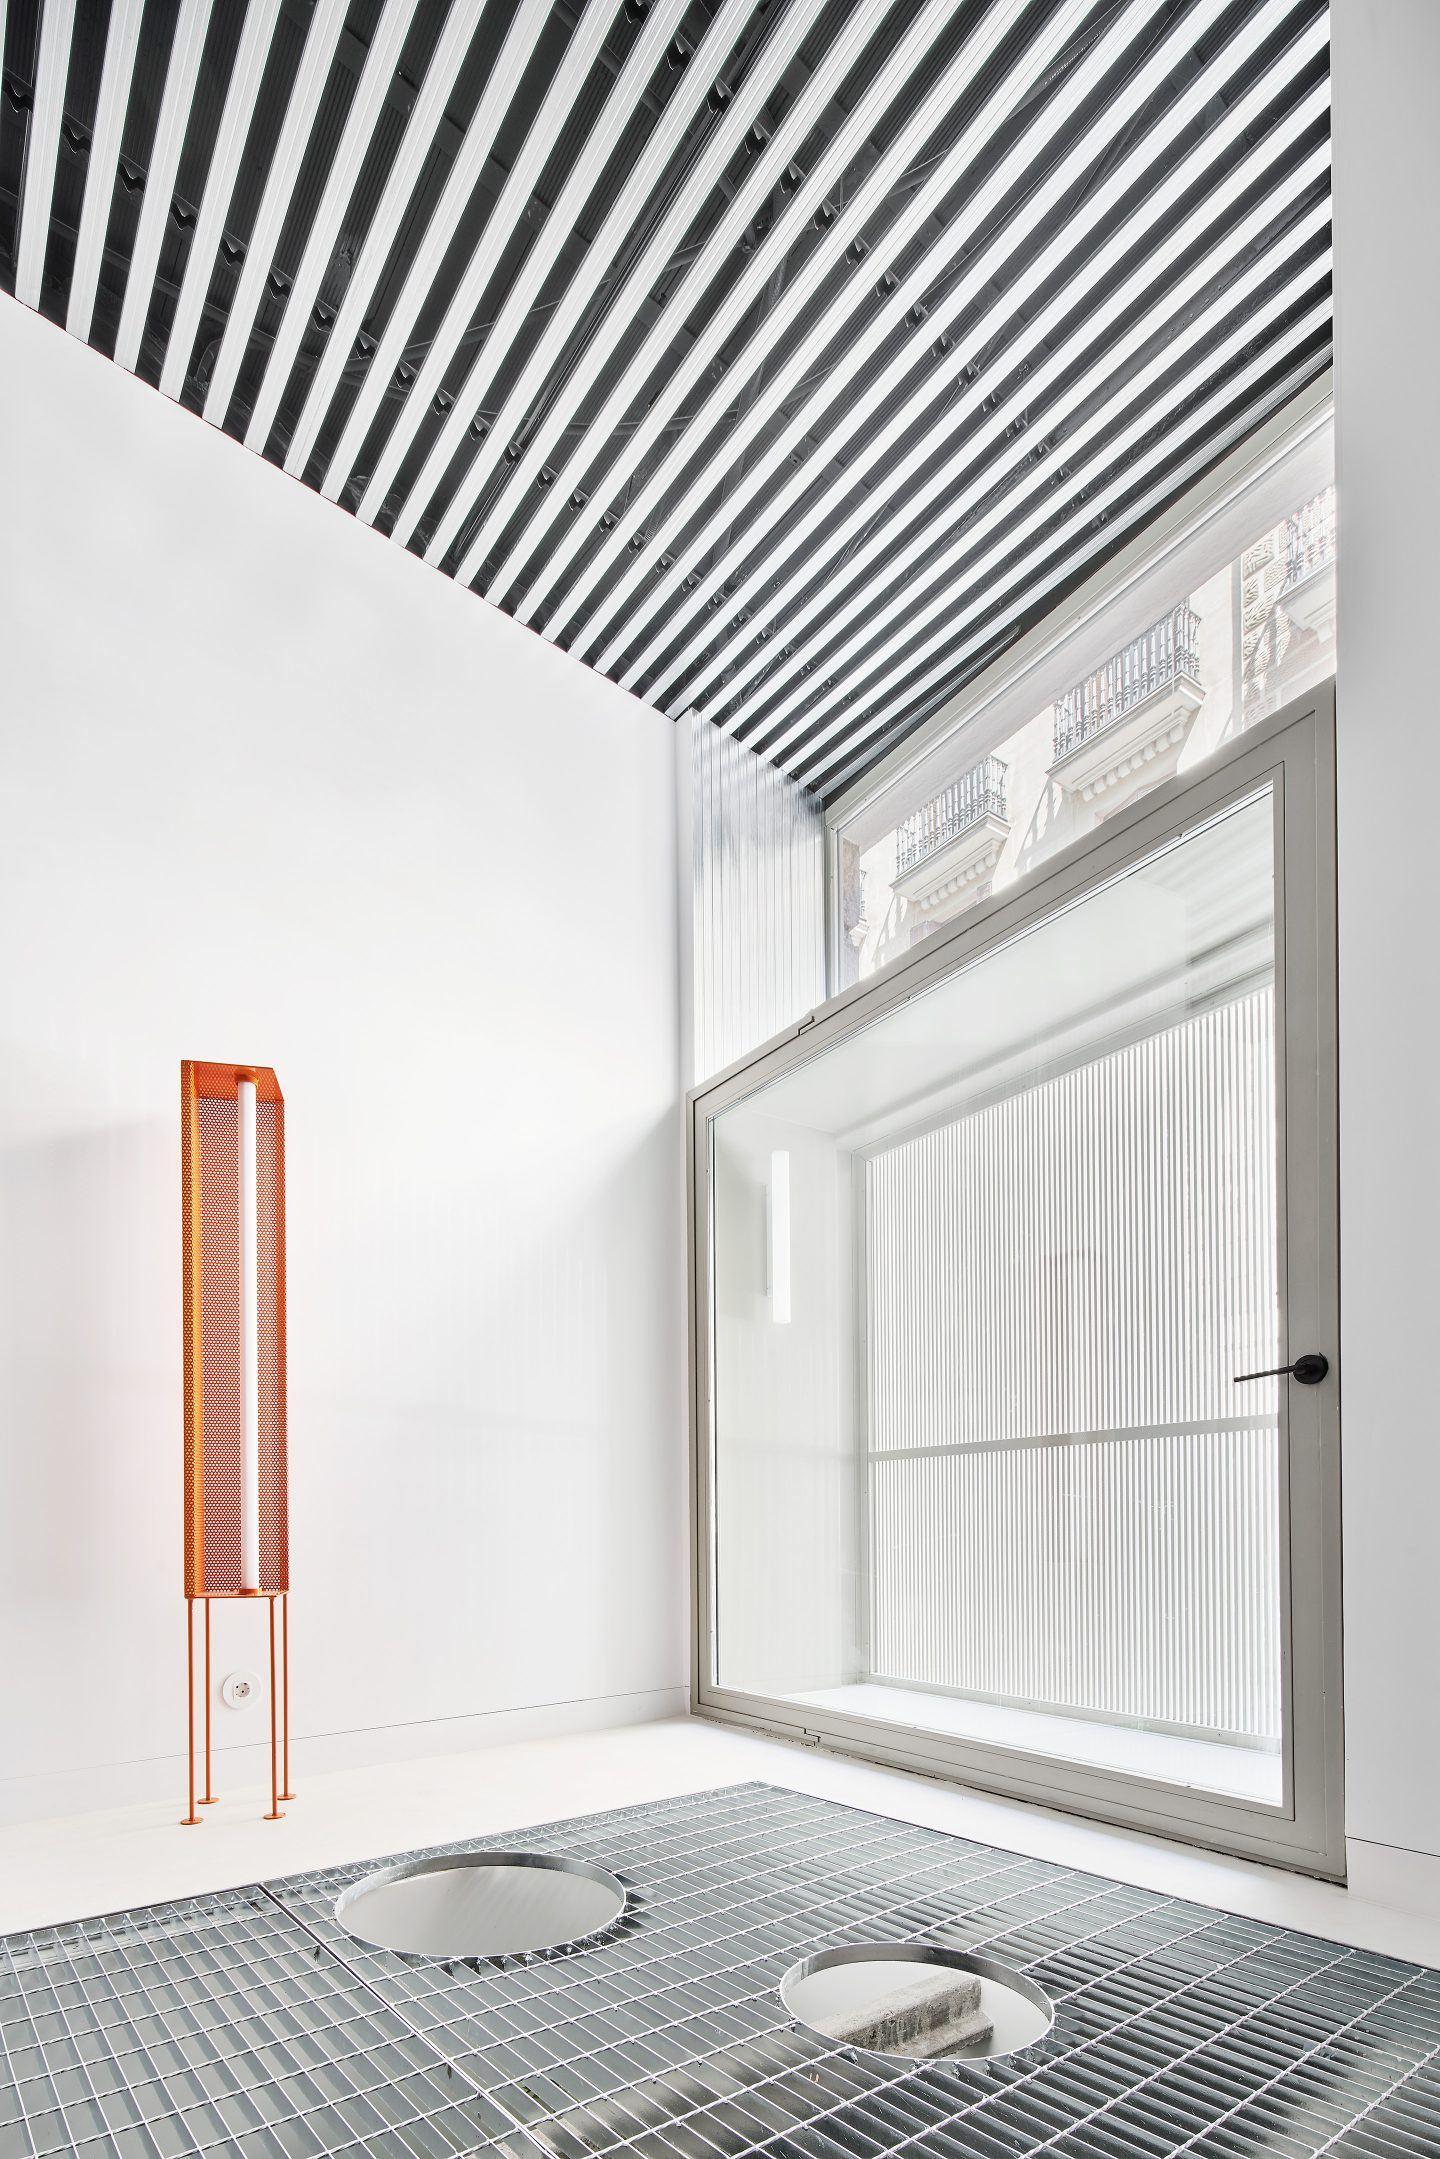 IGNANT-Architecture-Lucas-y-Hernandez-Gil-Casa-A12-04